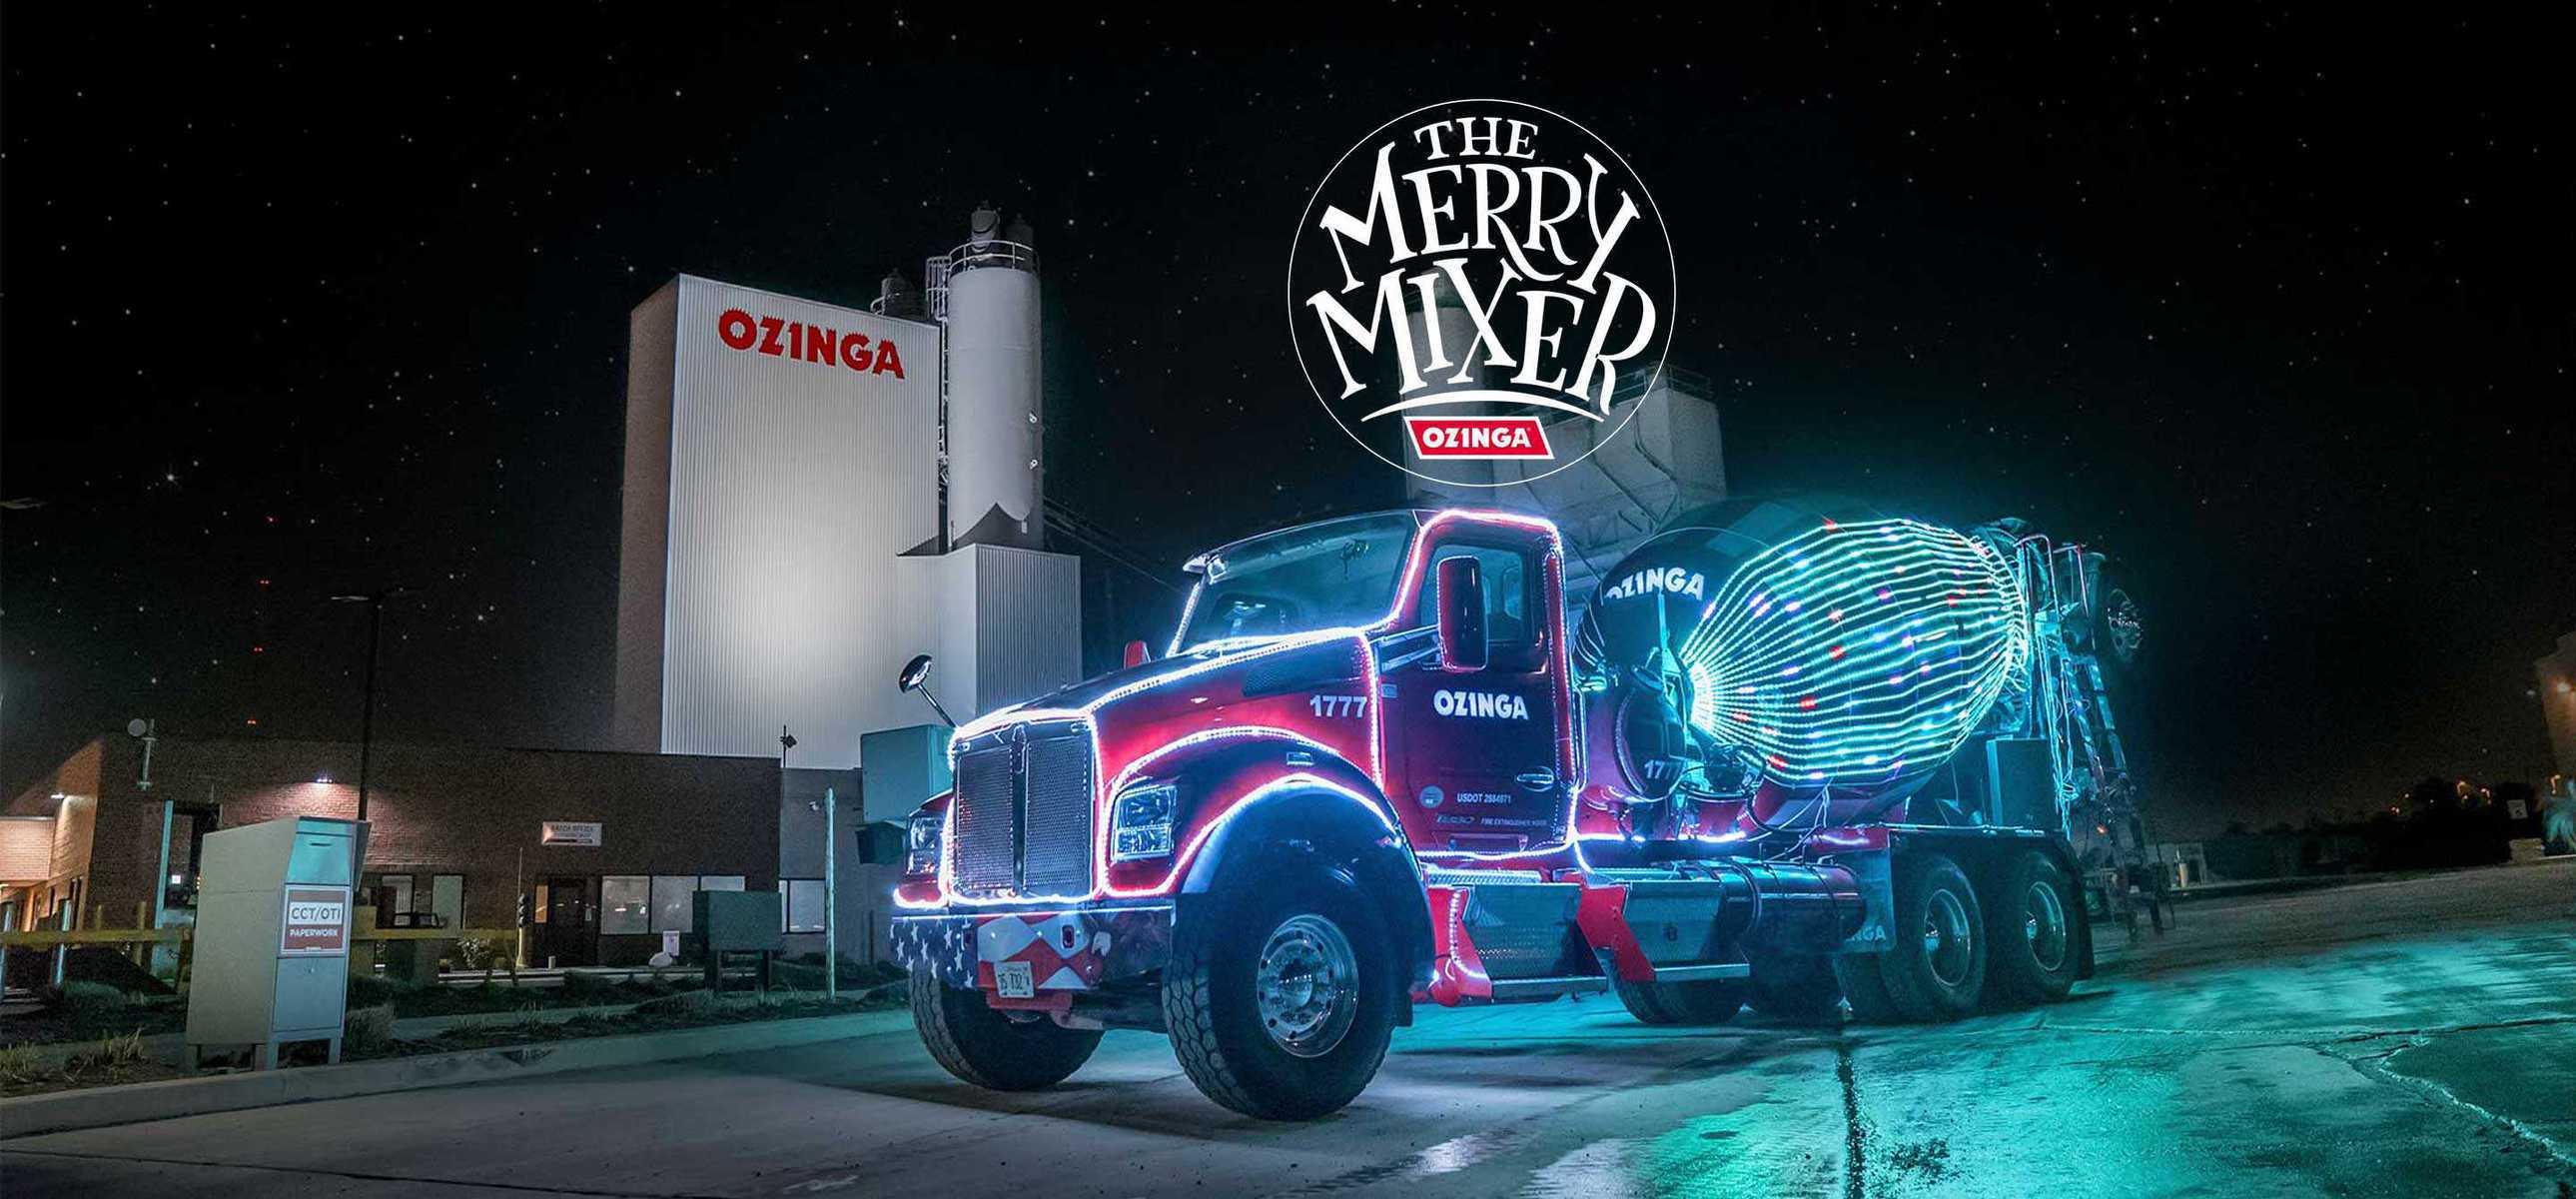 Ozinga Merry Mixer